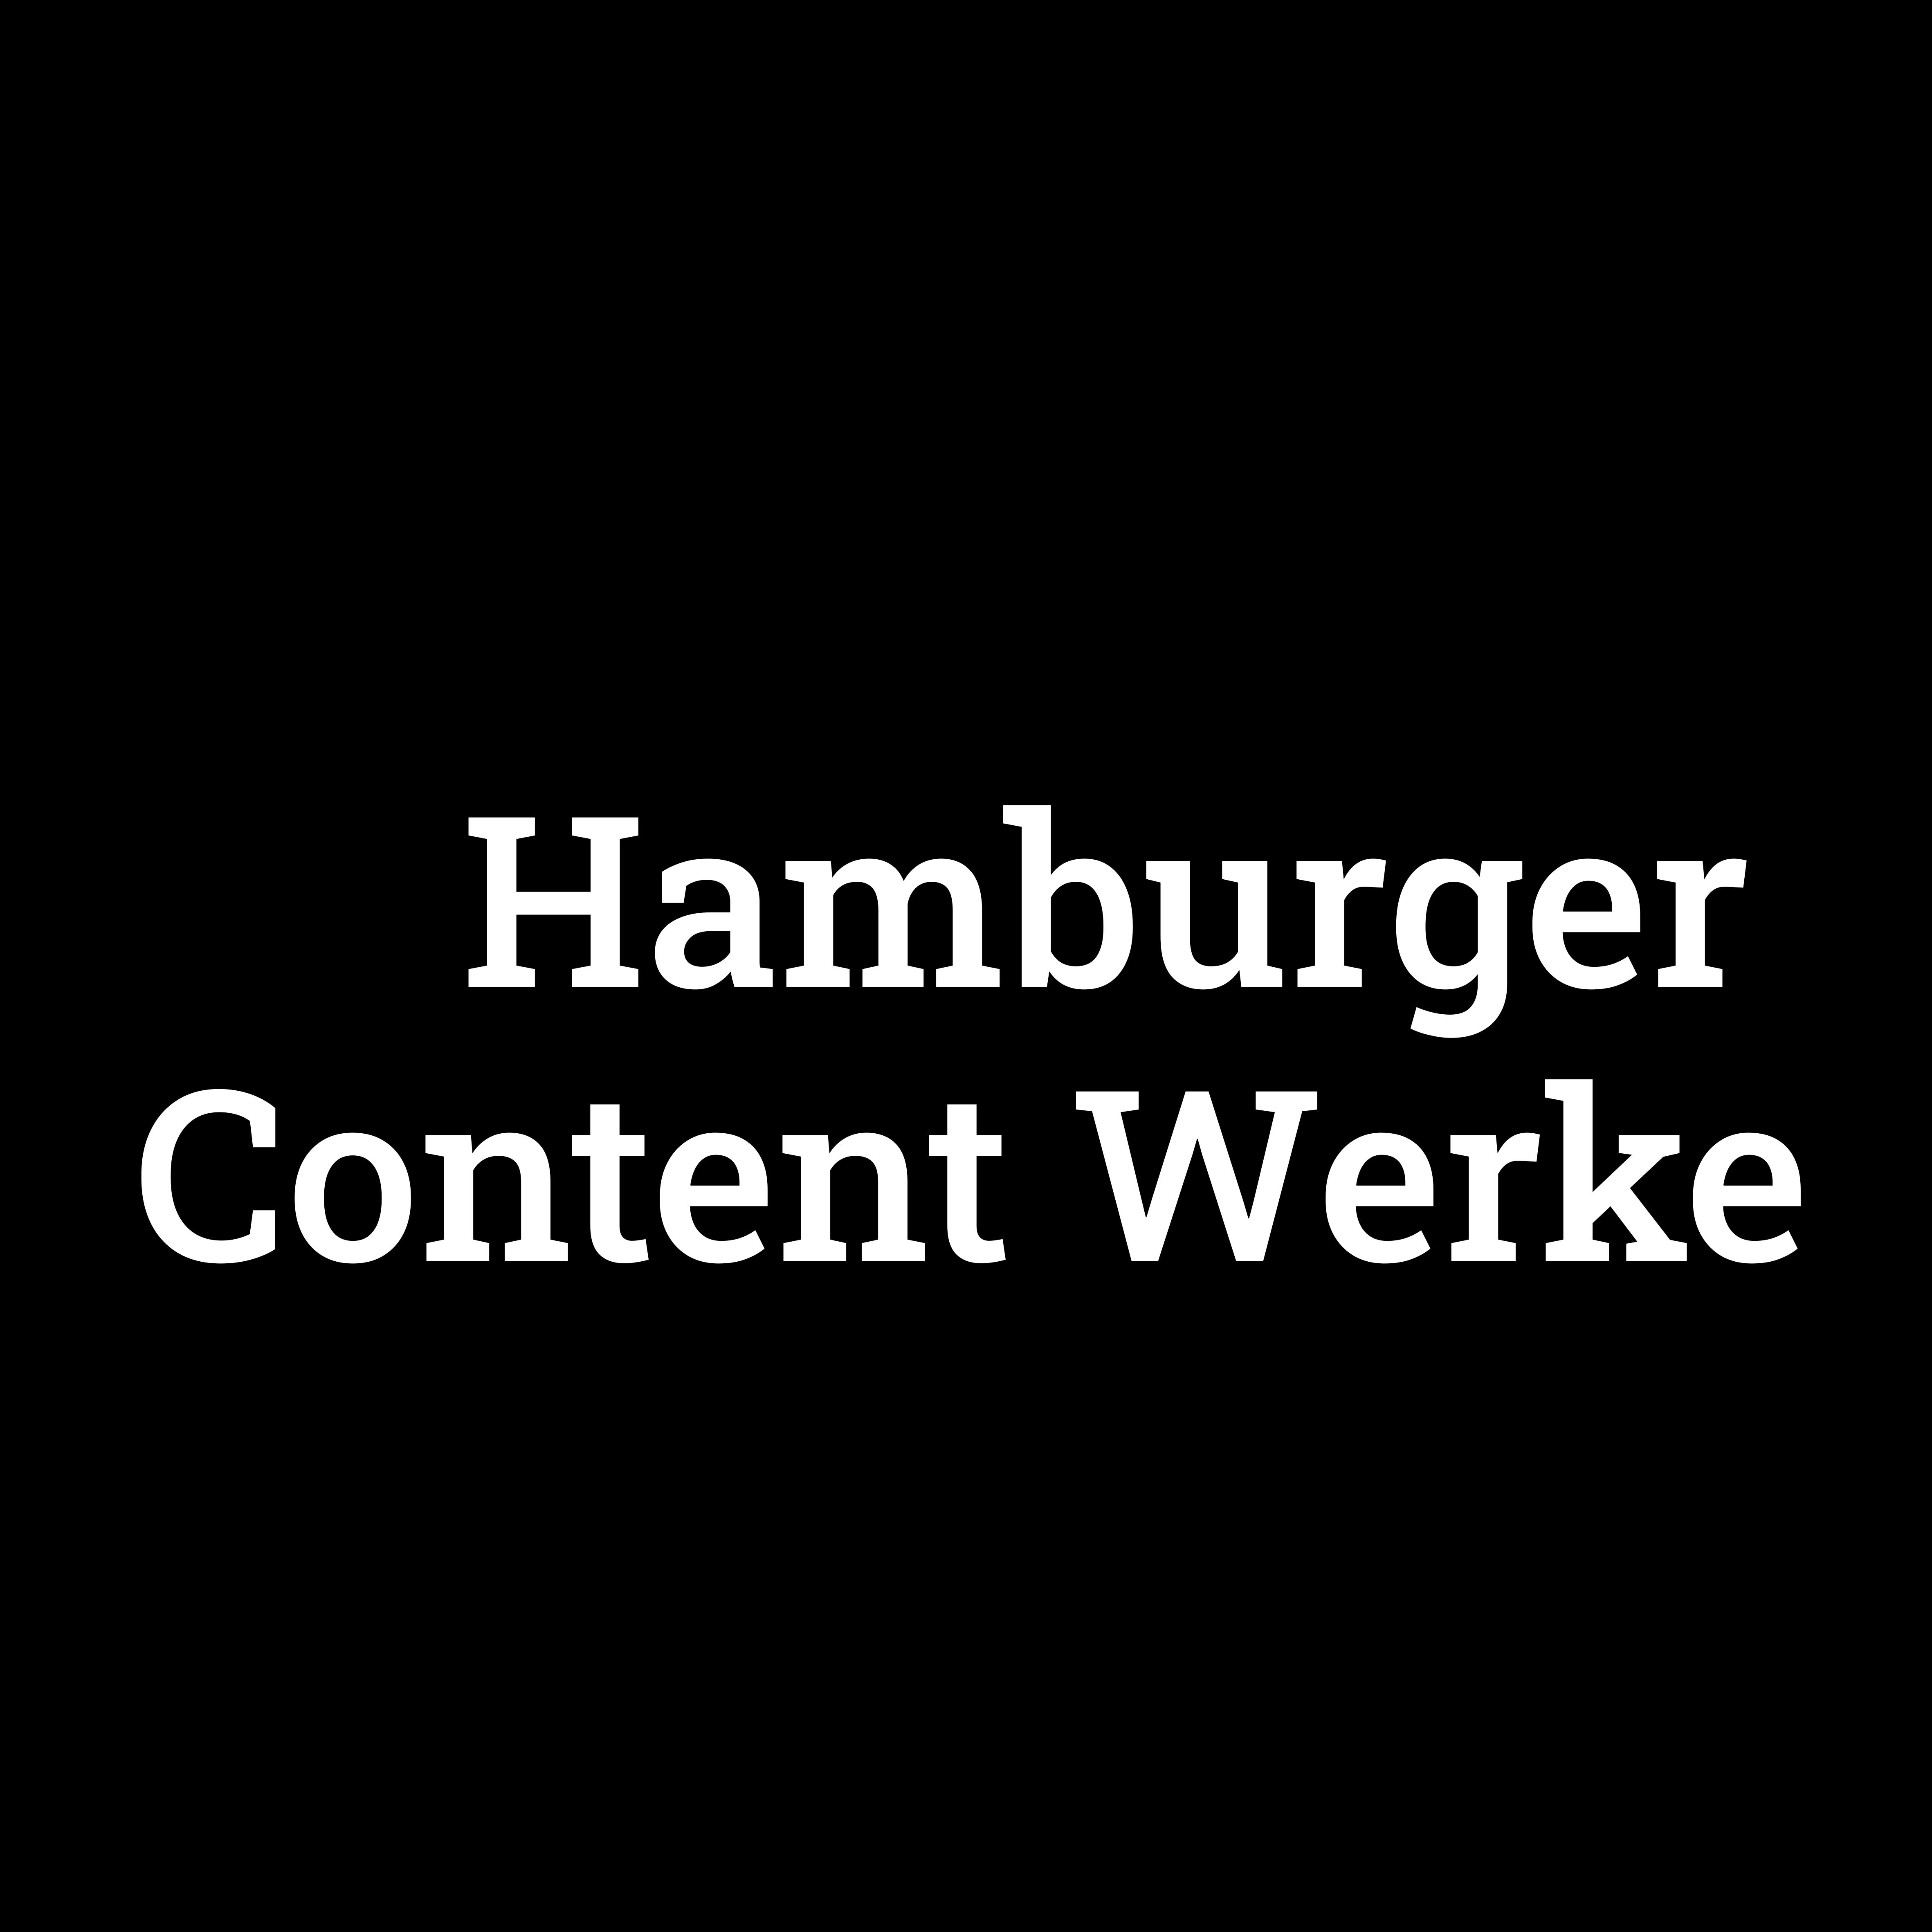 Hamburger Content Werke